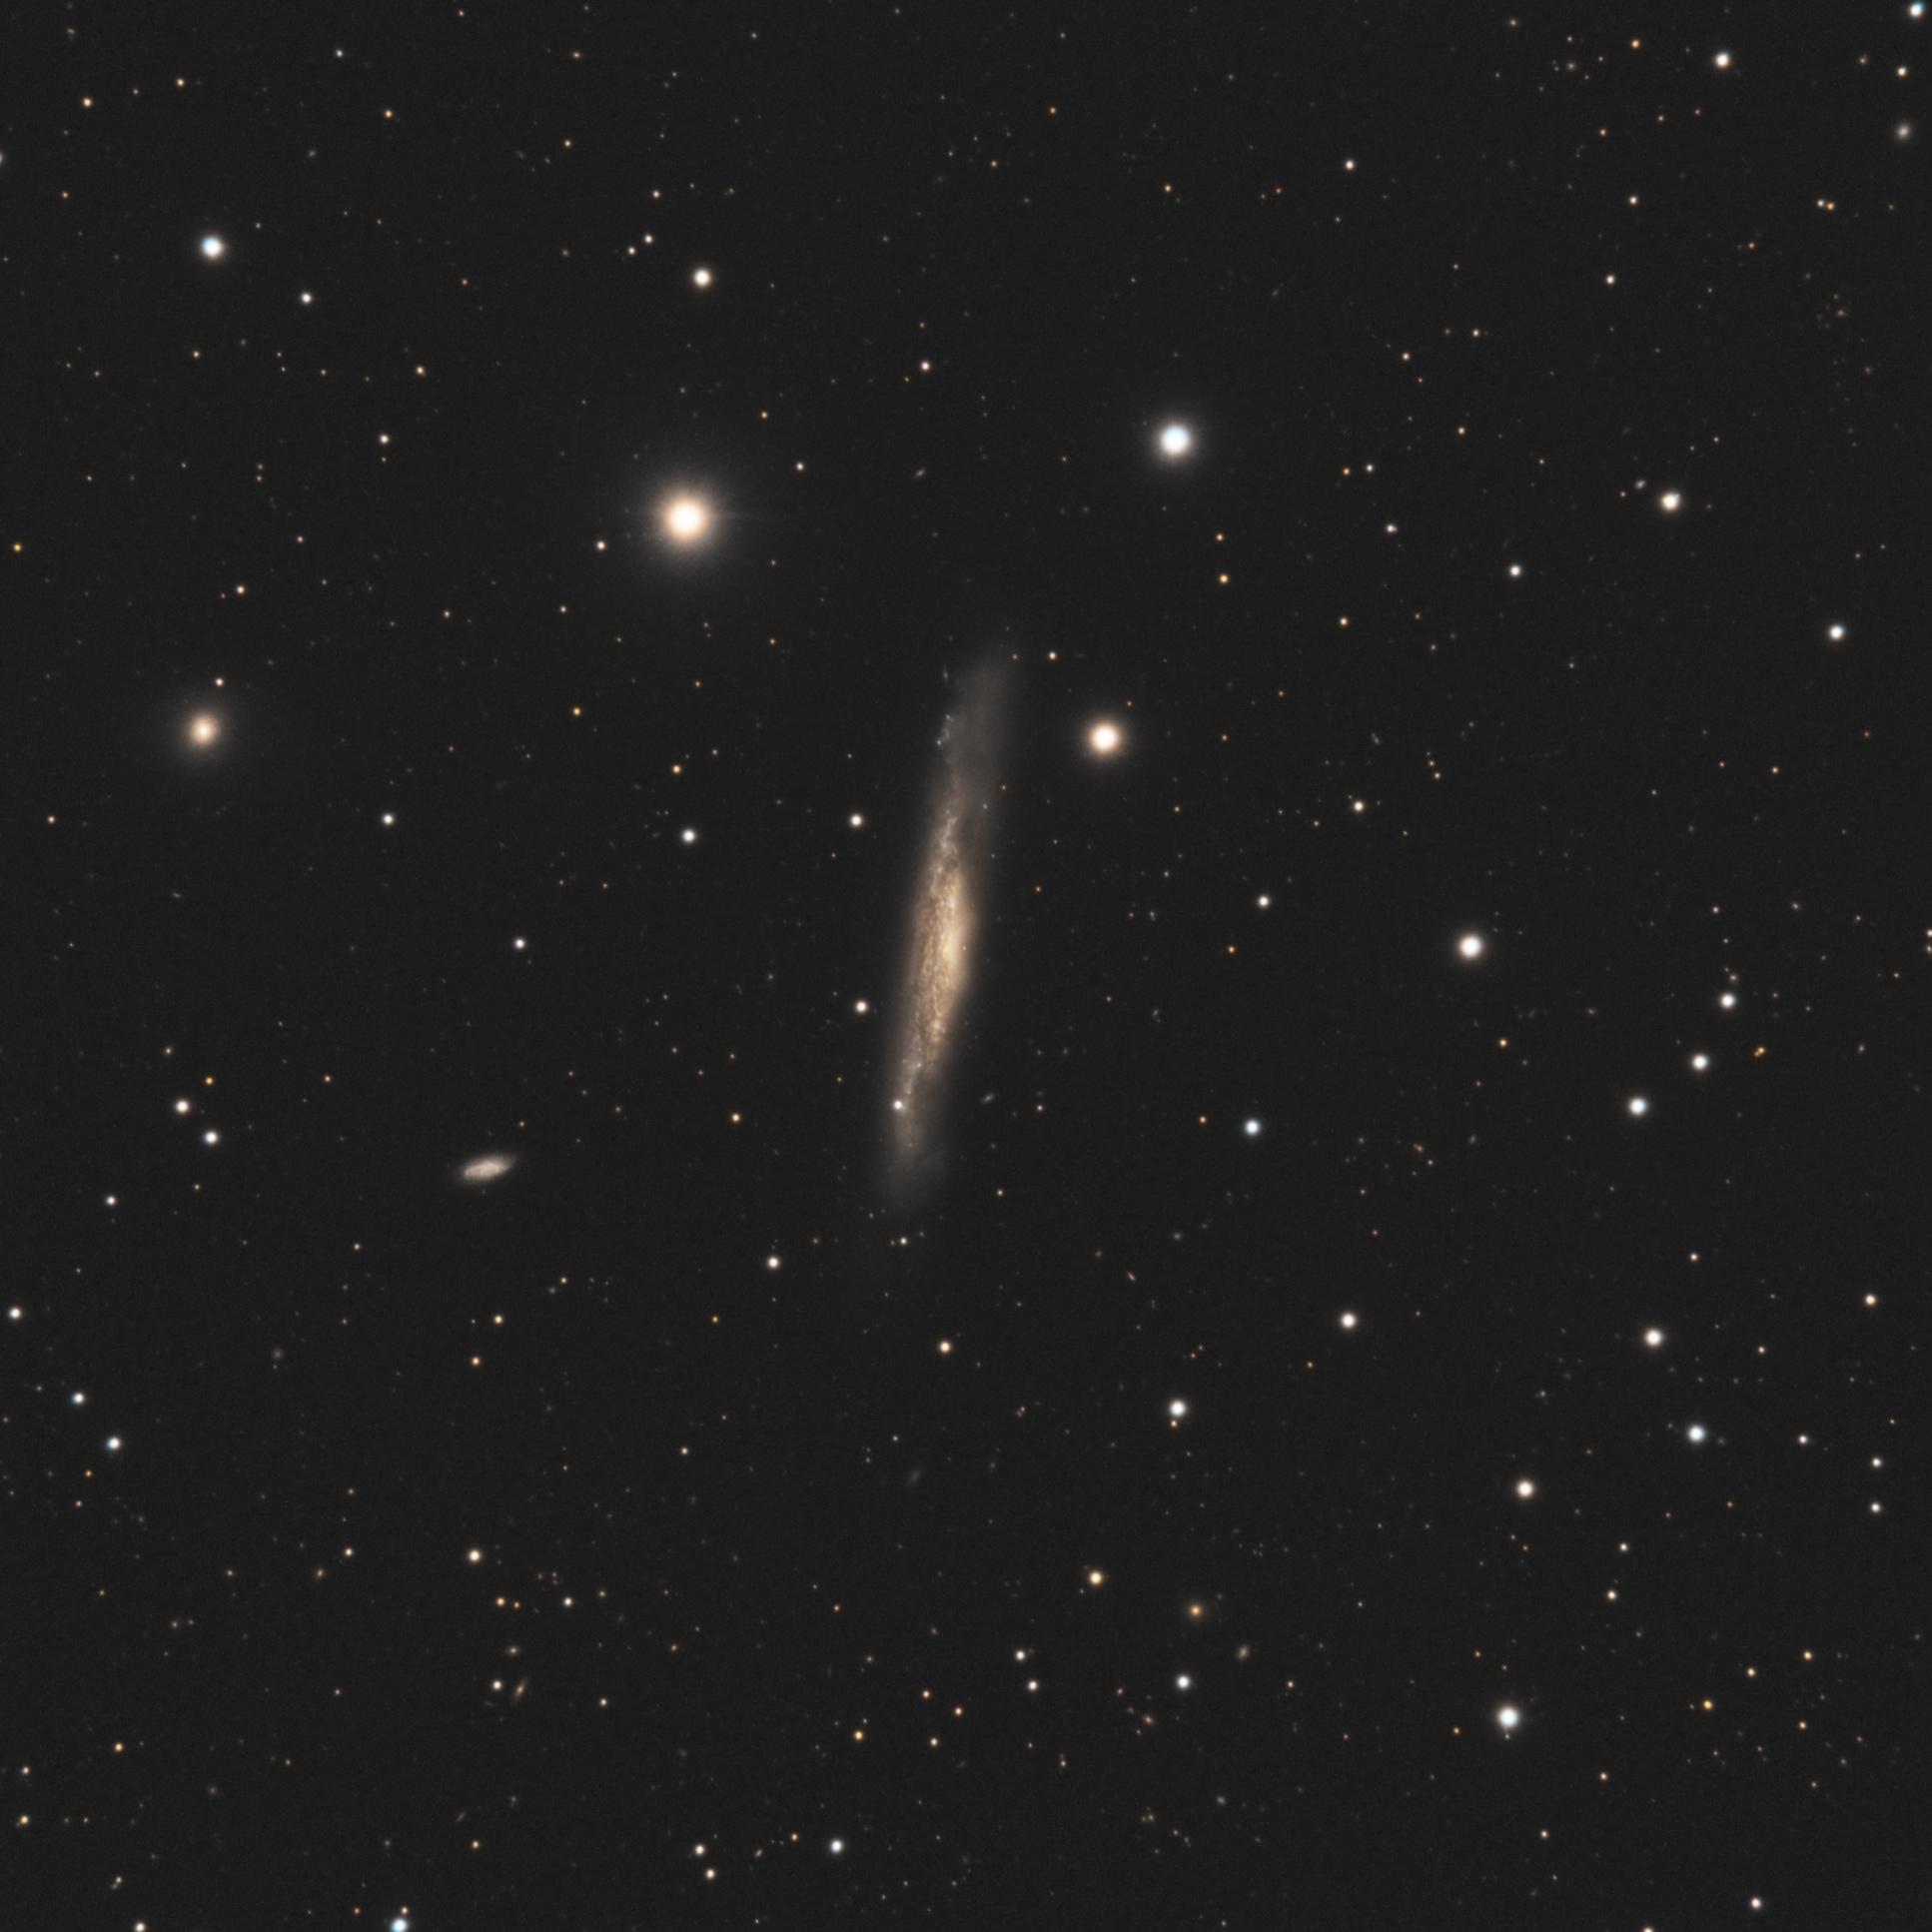 5c584453b5218_NGC3079.jpg.7bc7fa623e21b1d23c38c307cefe7ebc.jpg